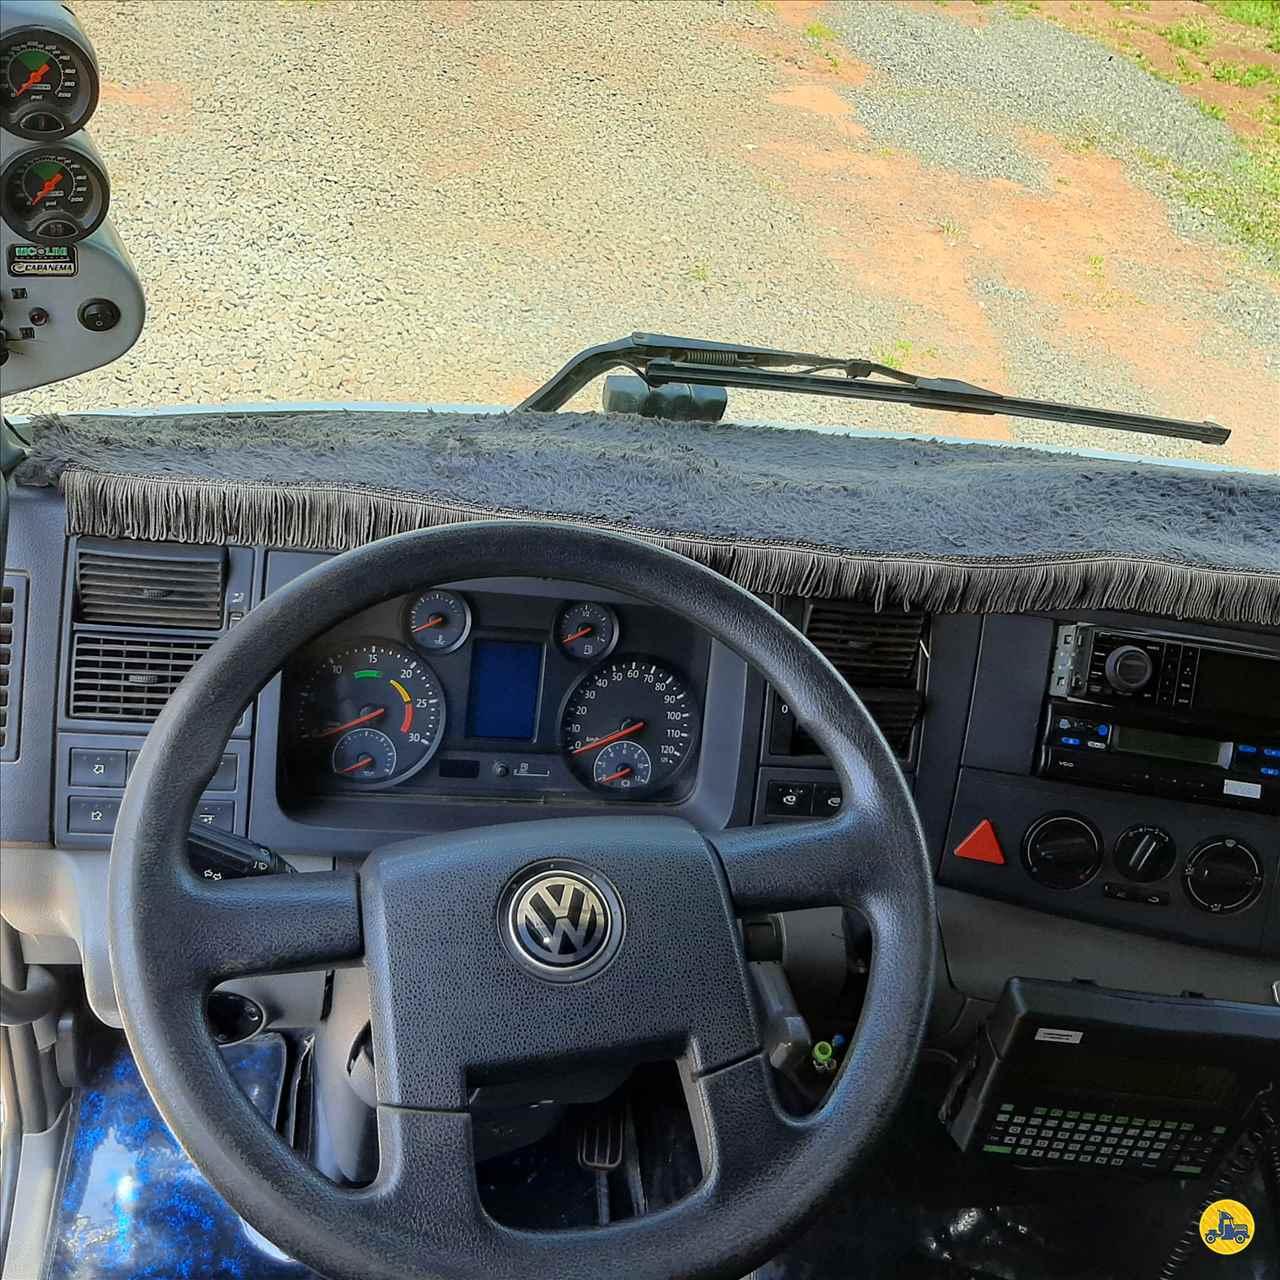 VOLKSWAGEN VW 25420  2014/2014 Megatruck Caminhões e Máquinas